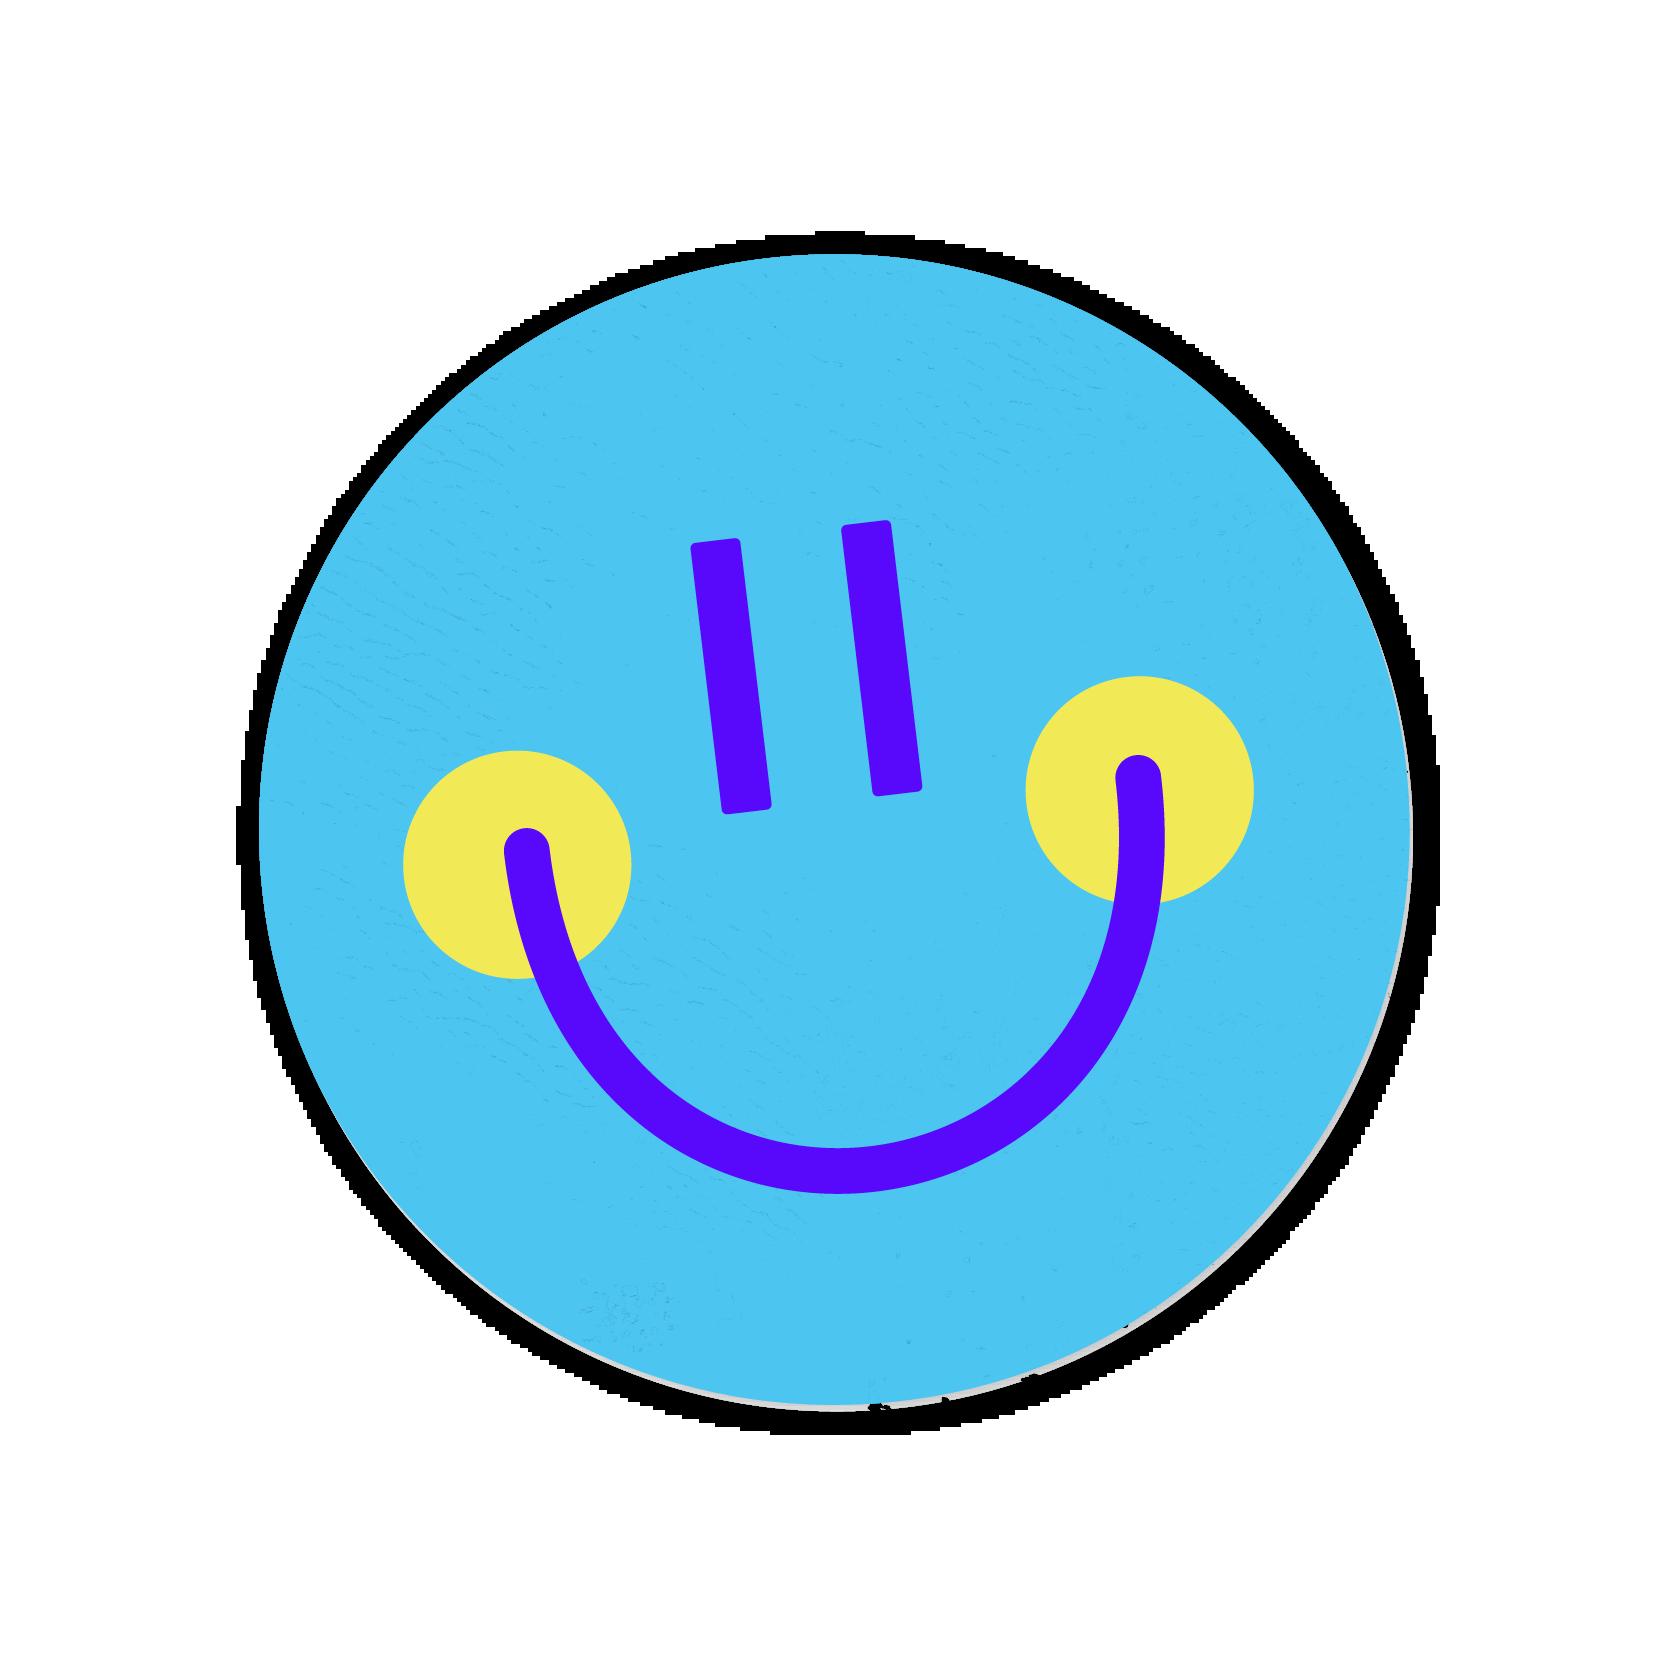 A blue smiley face sticker